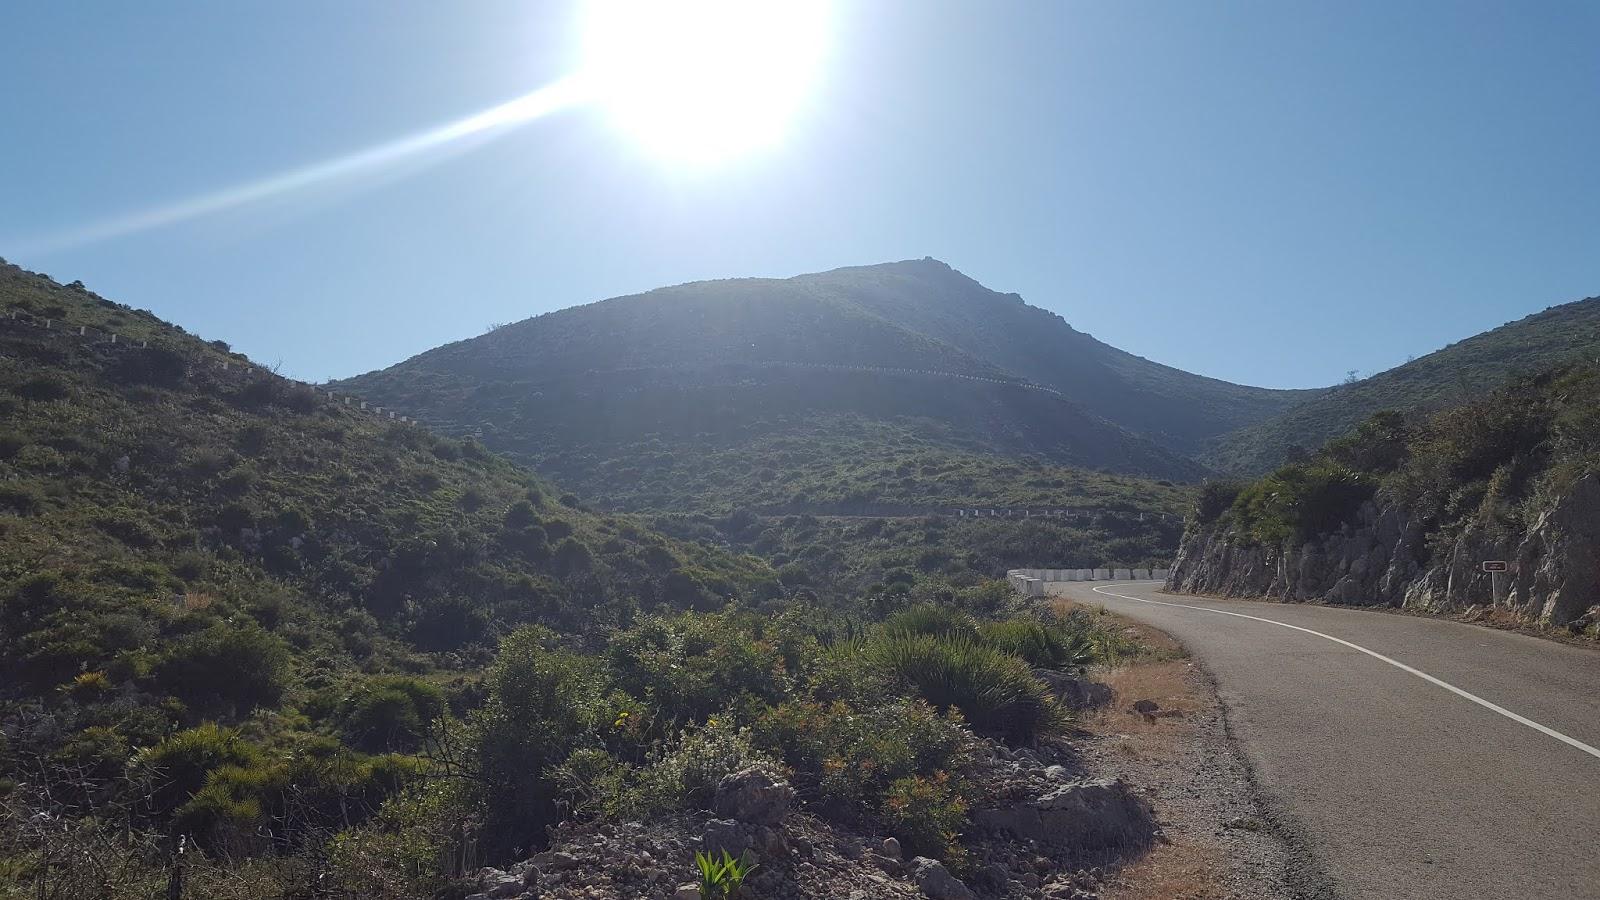 The long and winding road, Vall de Ebo, Alicante